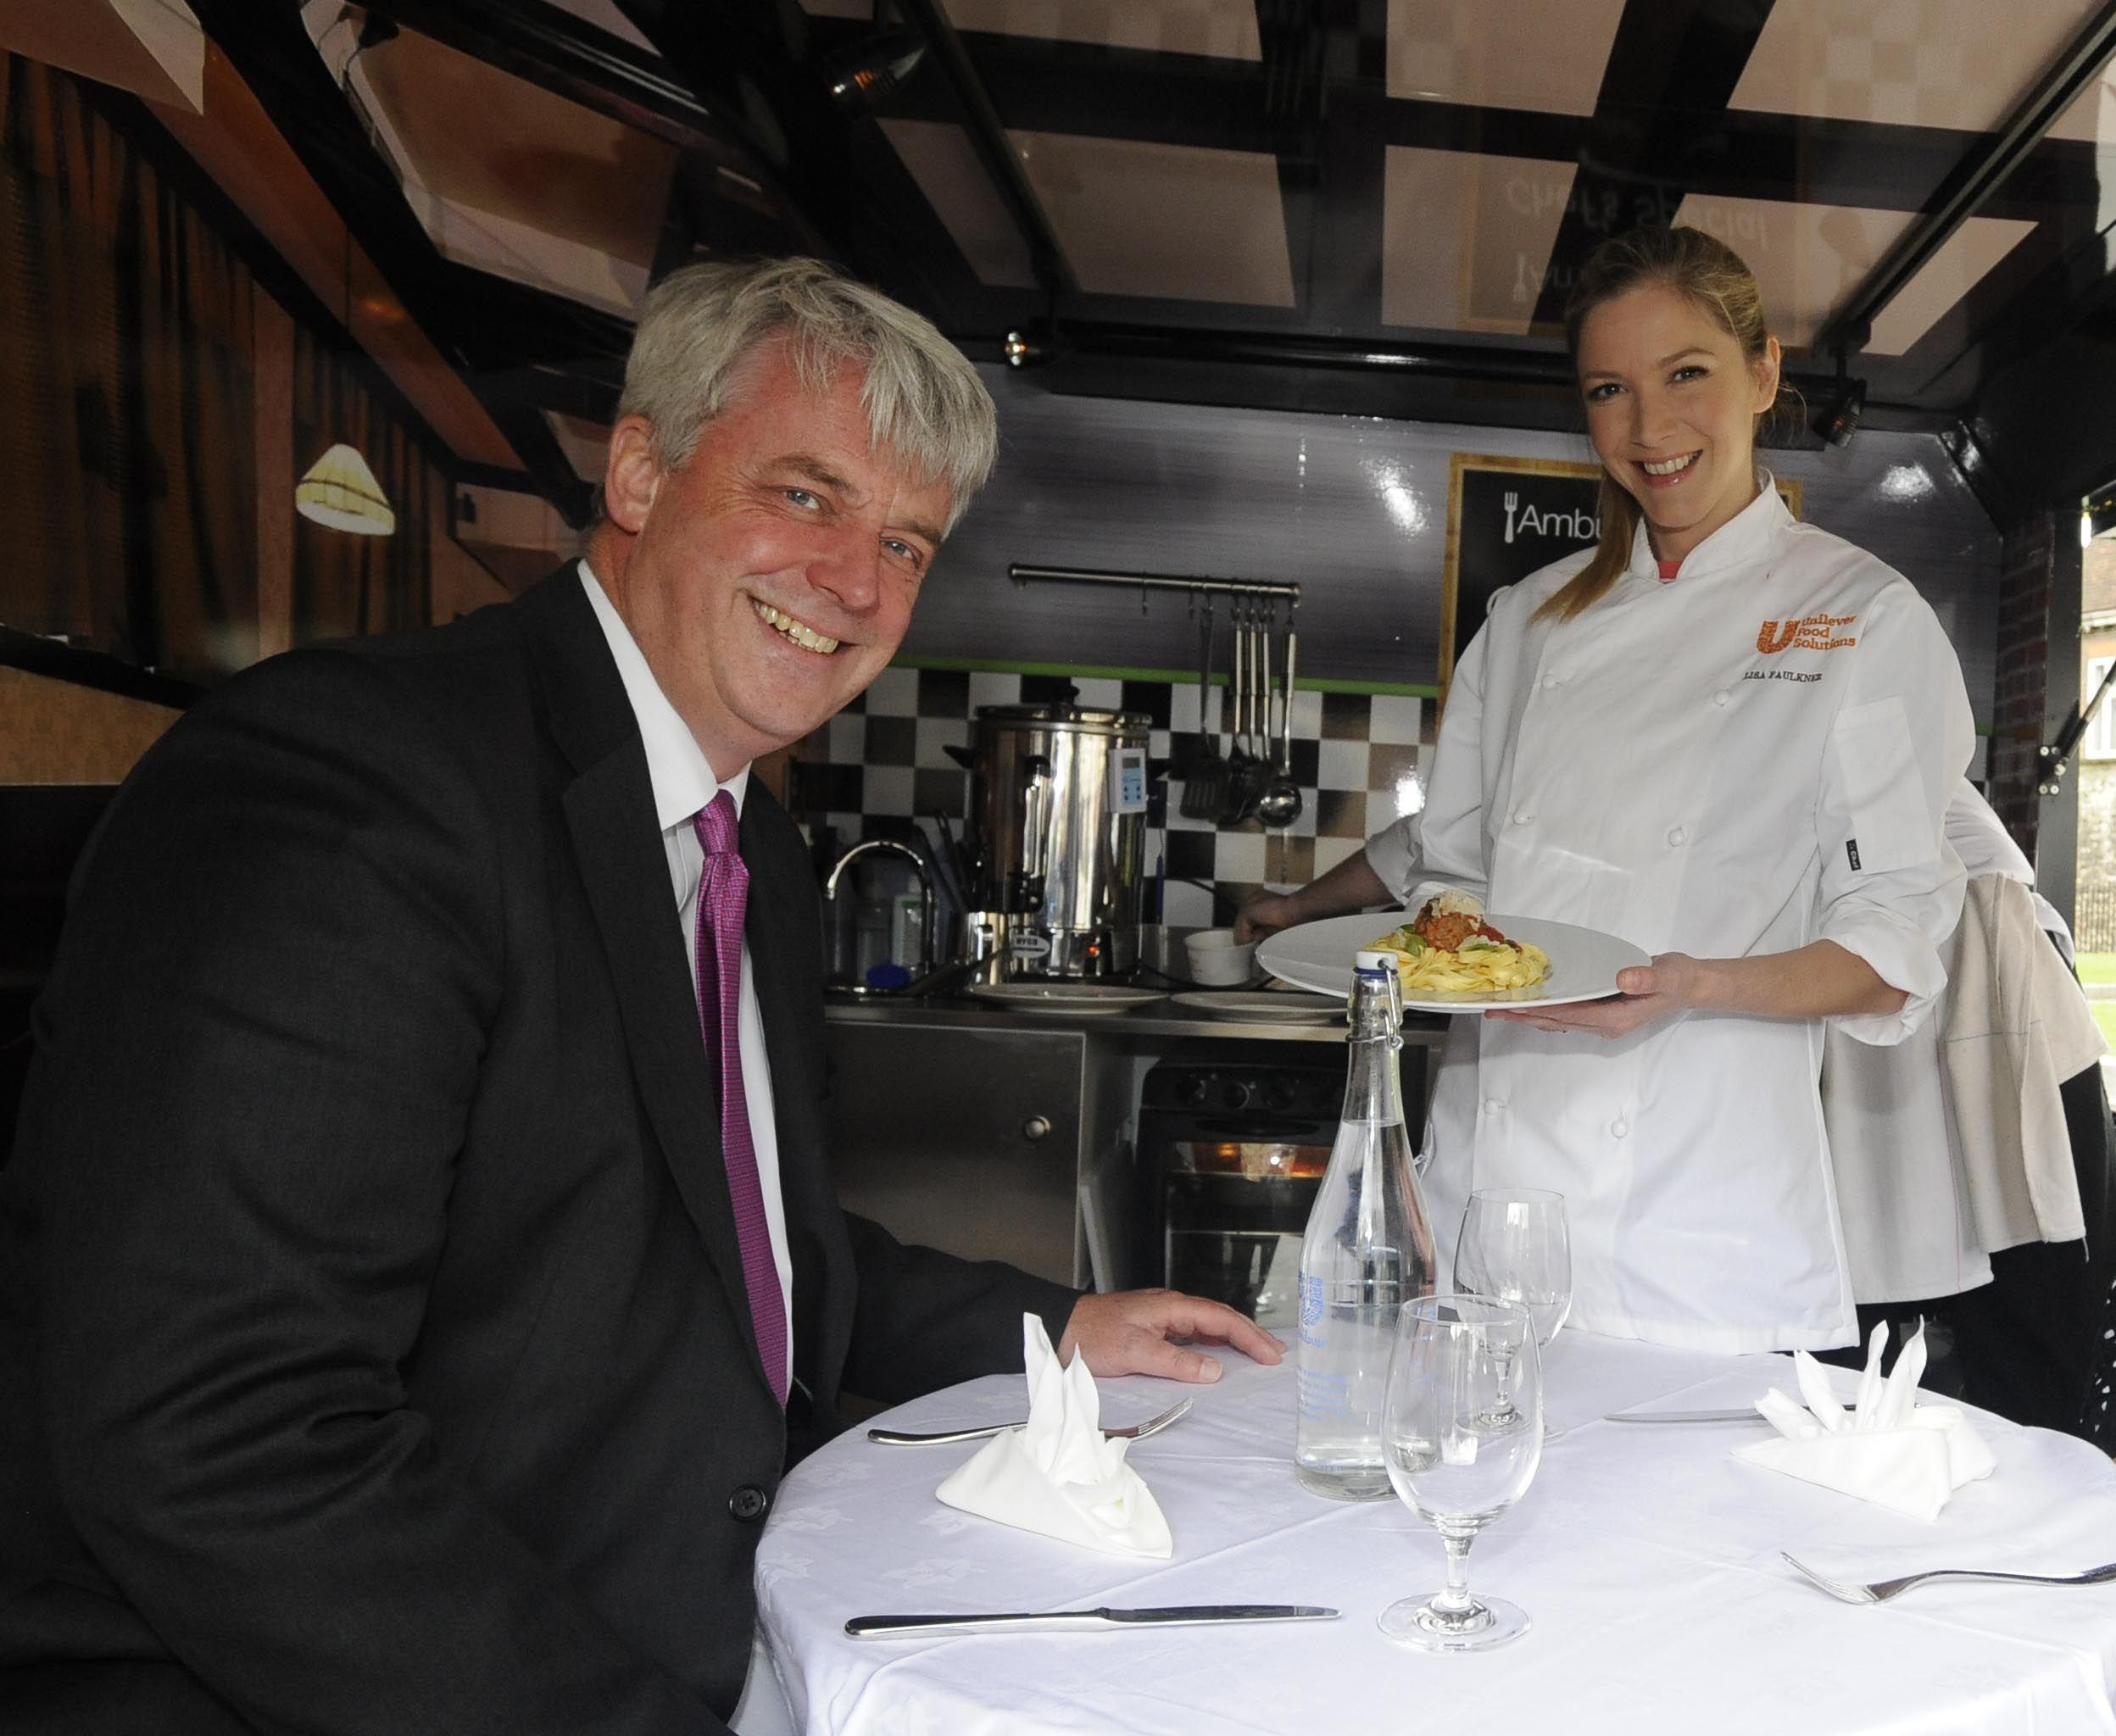 Health Secretary Andrew Lansley and Celebrity MasterChef winner Lisa Faulkner on board the 'Ambu-lunch'.